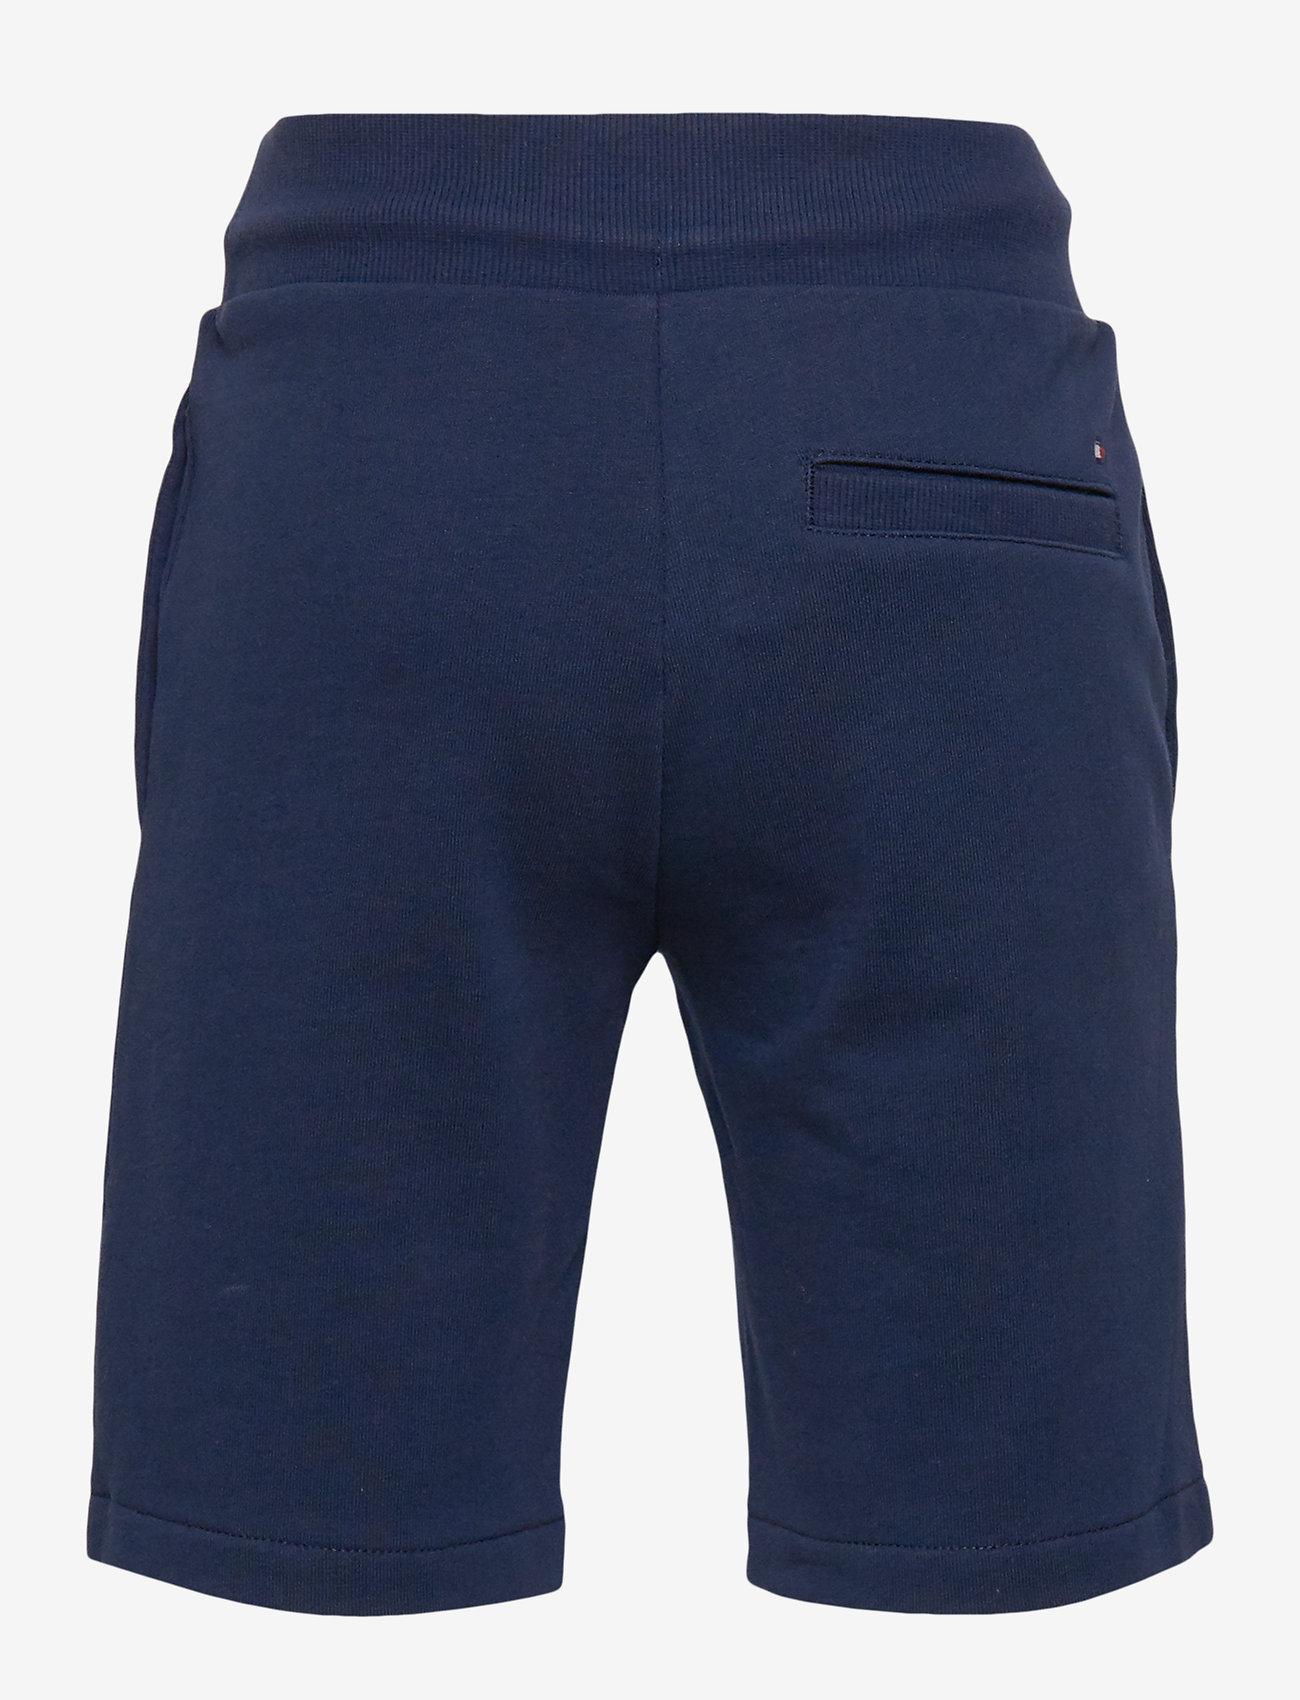 Tommy Hilfiger - ESSENTIAL SWEATSHORTS - shorts - twilight navy - 1